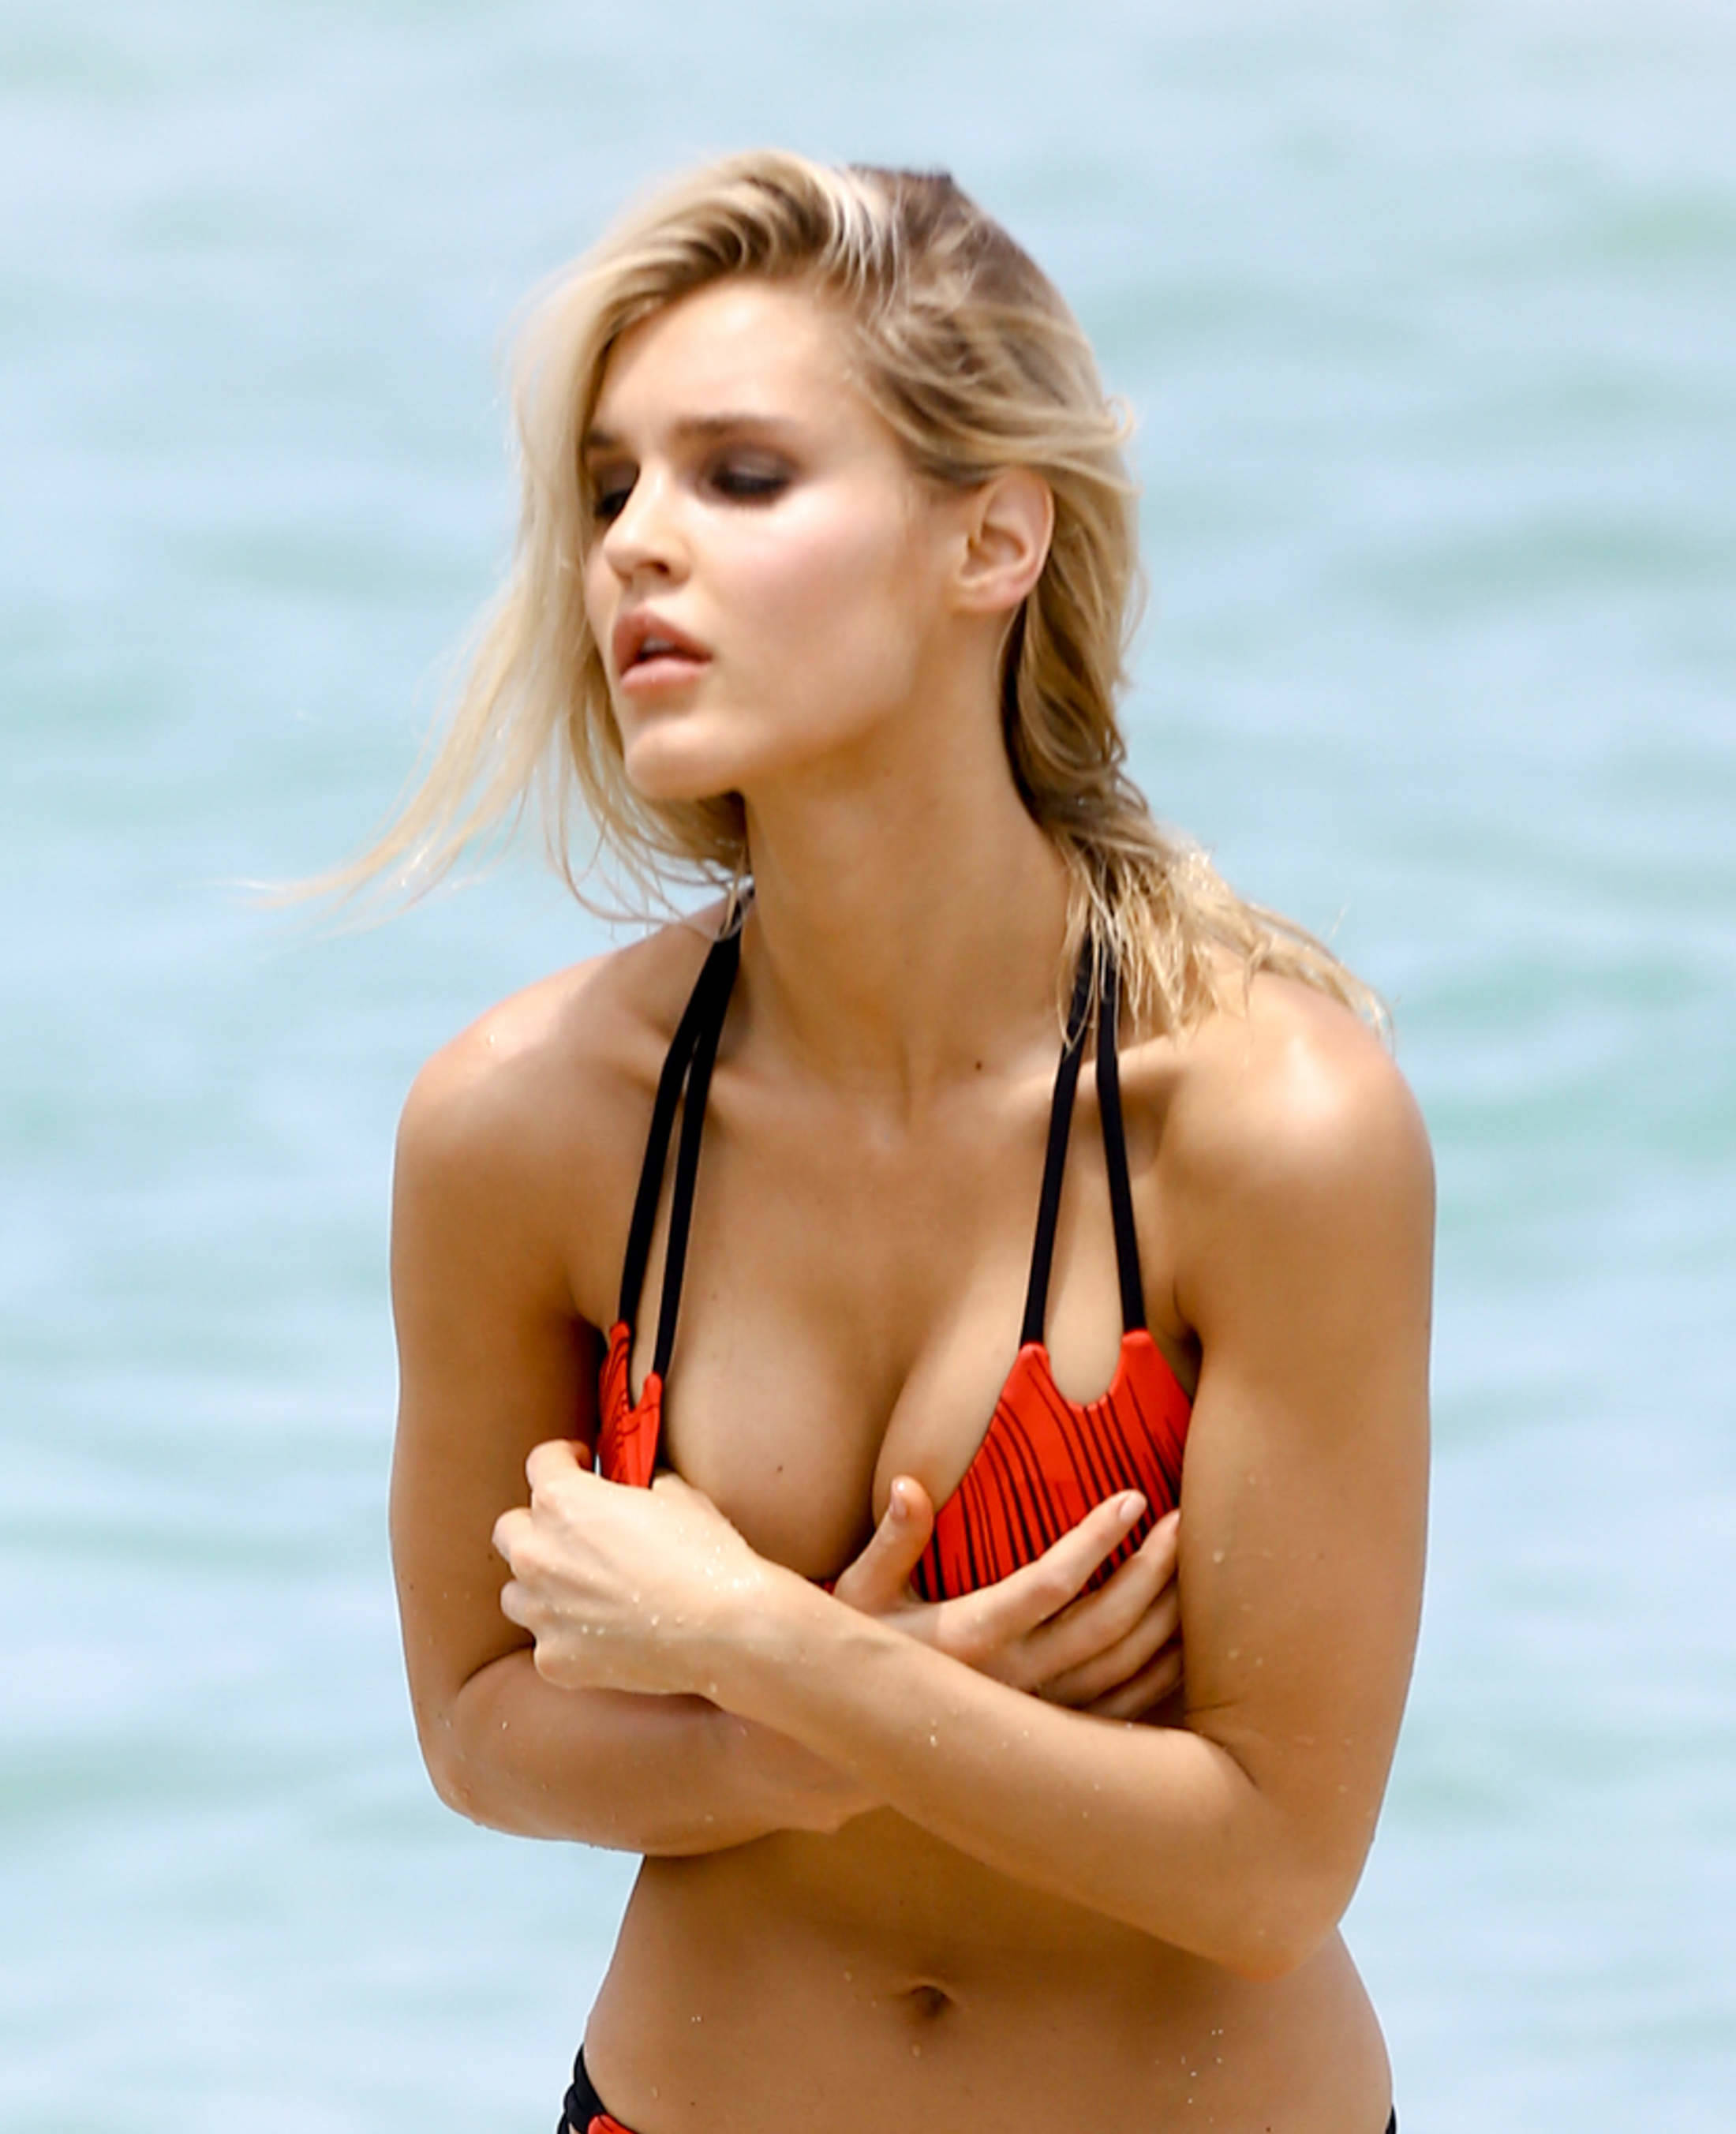 Joy Corrigan Naked sports illustrated model joy corrigan's naked breast popped